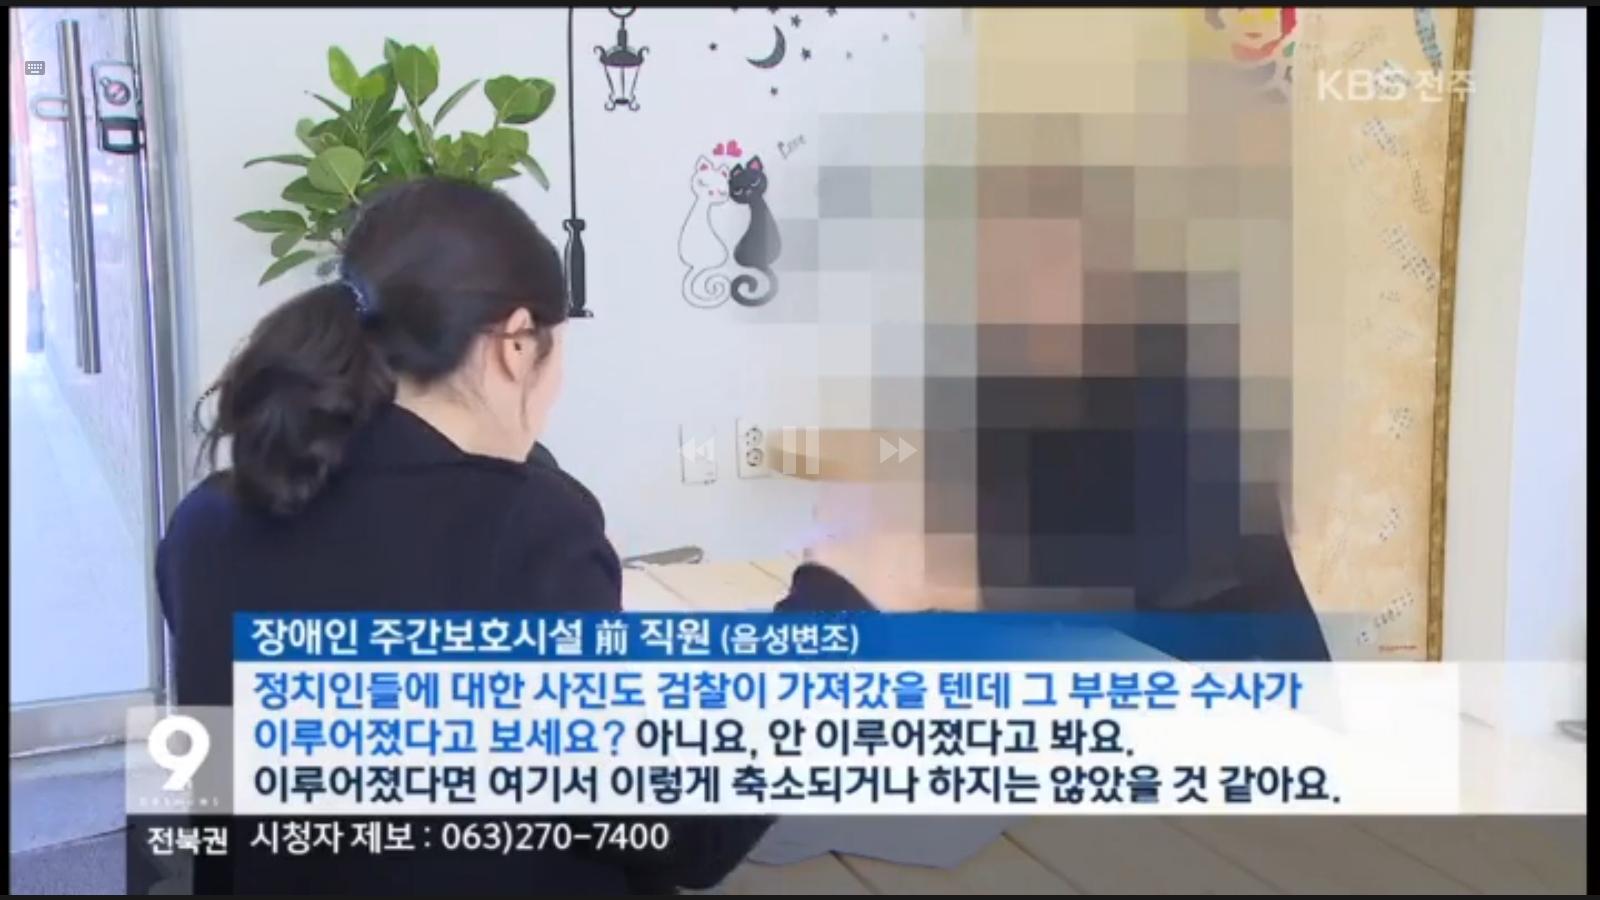 [18.4.4 KBS전주] 전주 봉침게이트, 수사 적정성 요청..귀 닫은 검찰3.jpg